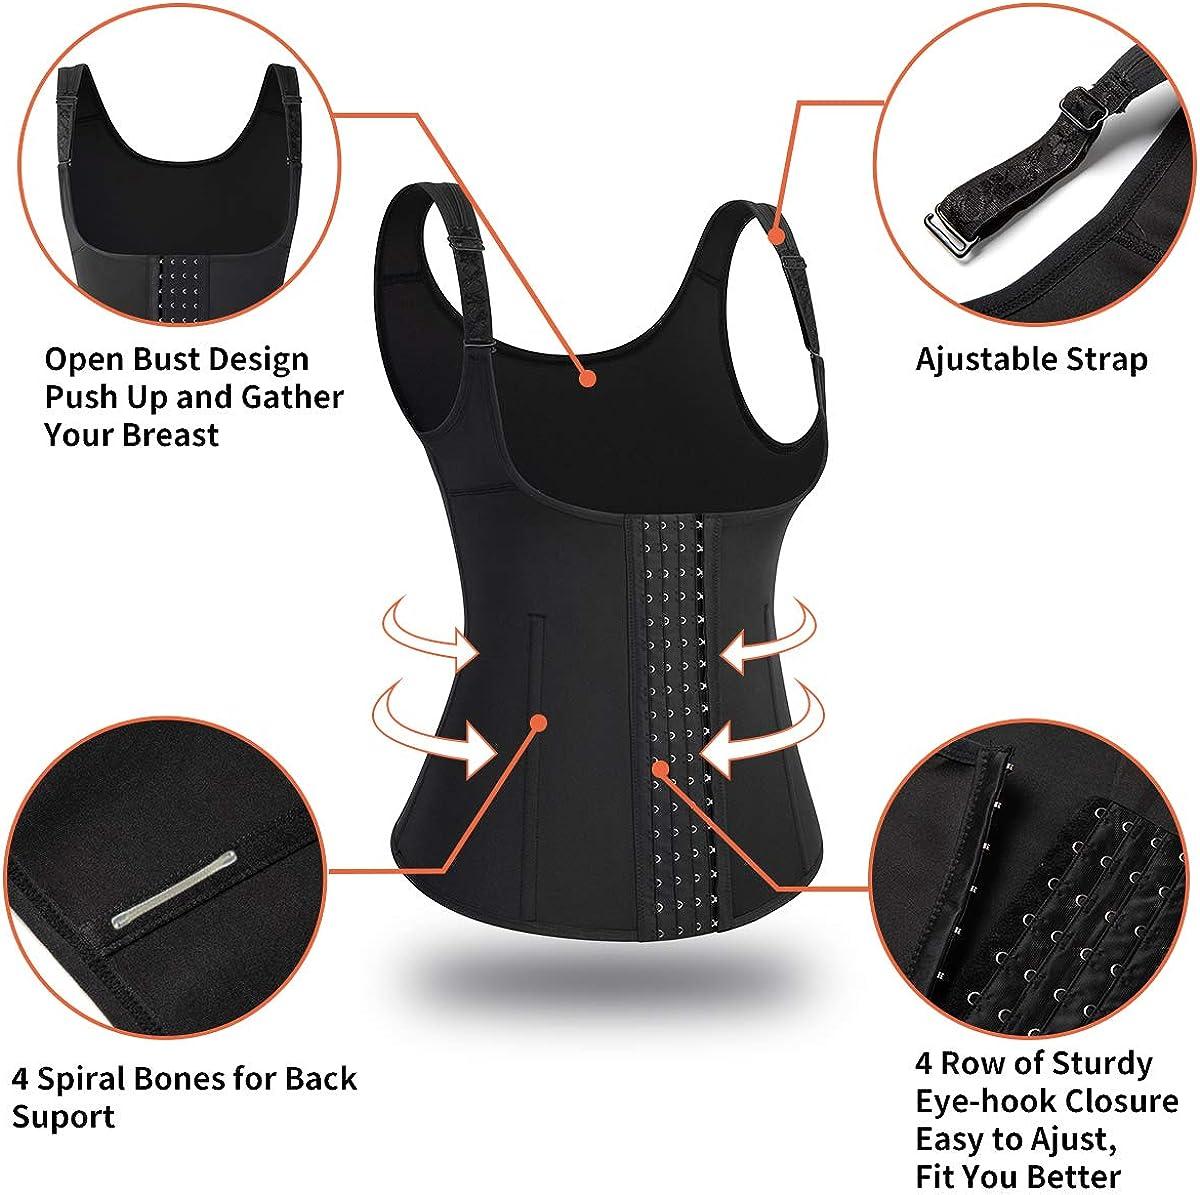 SHAPERIN Neoprene Sauna Sweat Waist Trainer Vest Slimming Body Shaper Waist Trimmer Tank Top with Belt for Women